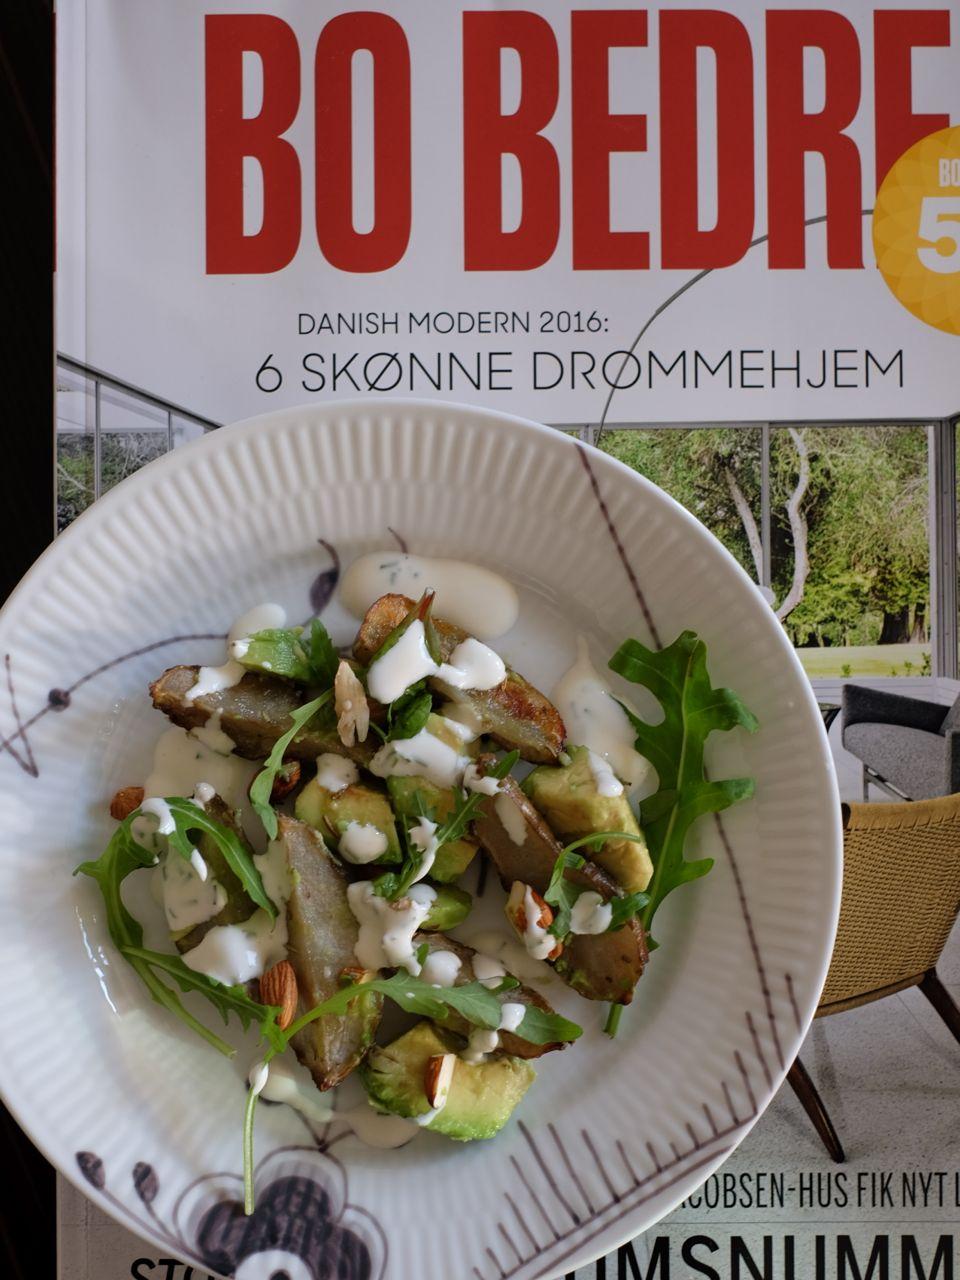 Jerusalem artichoke & avocado salad キクイモとアボカドのサラダ